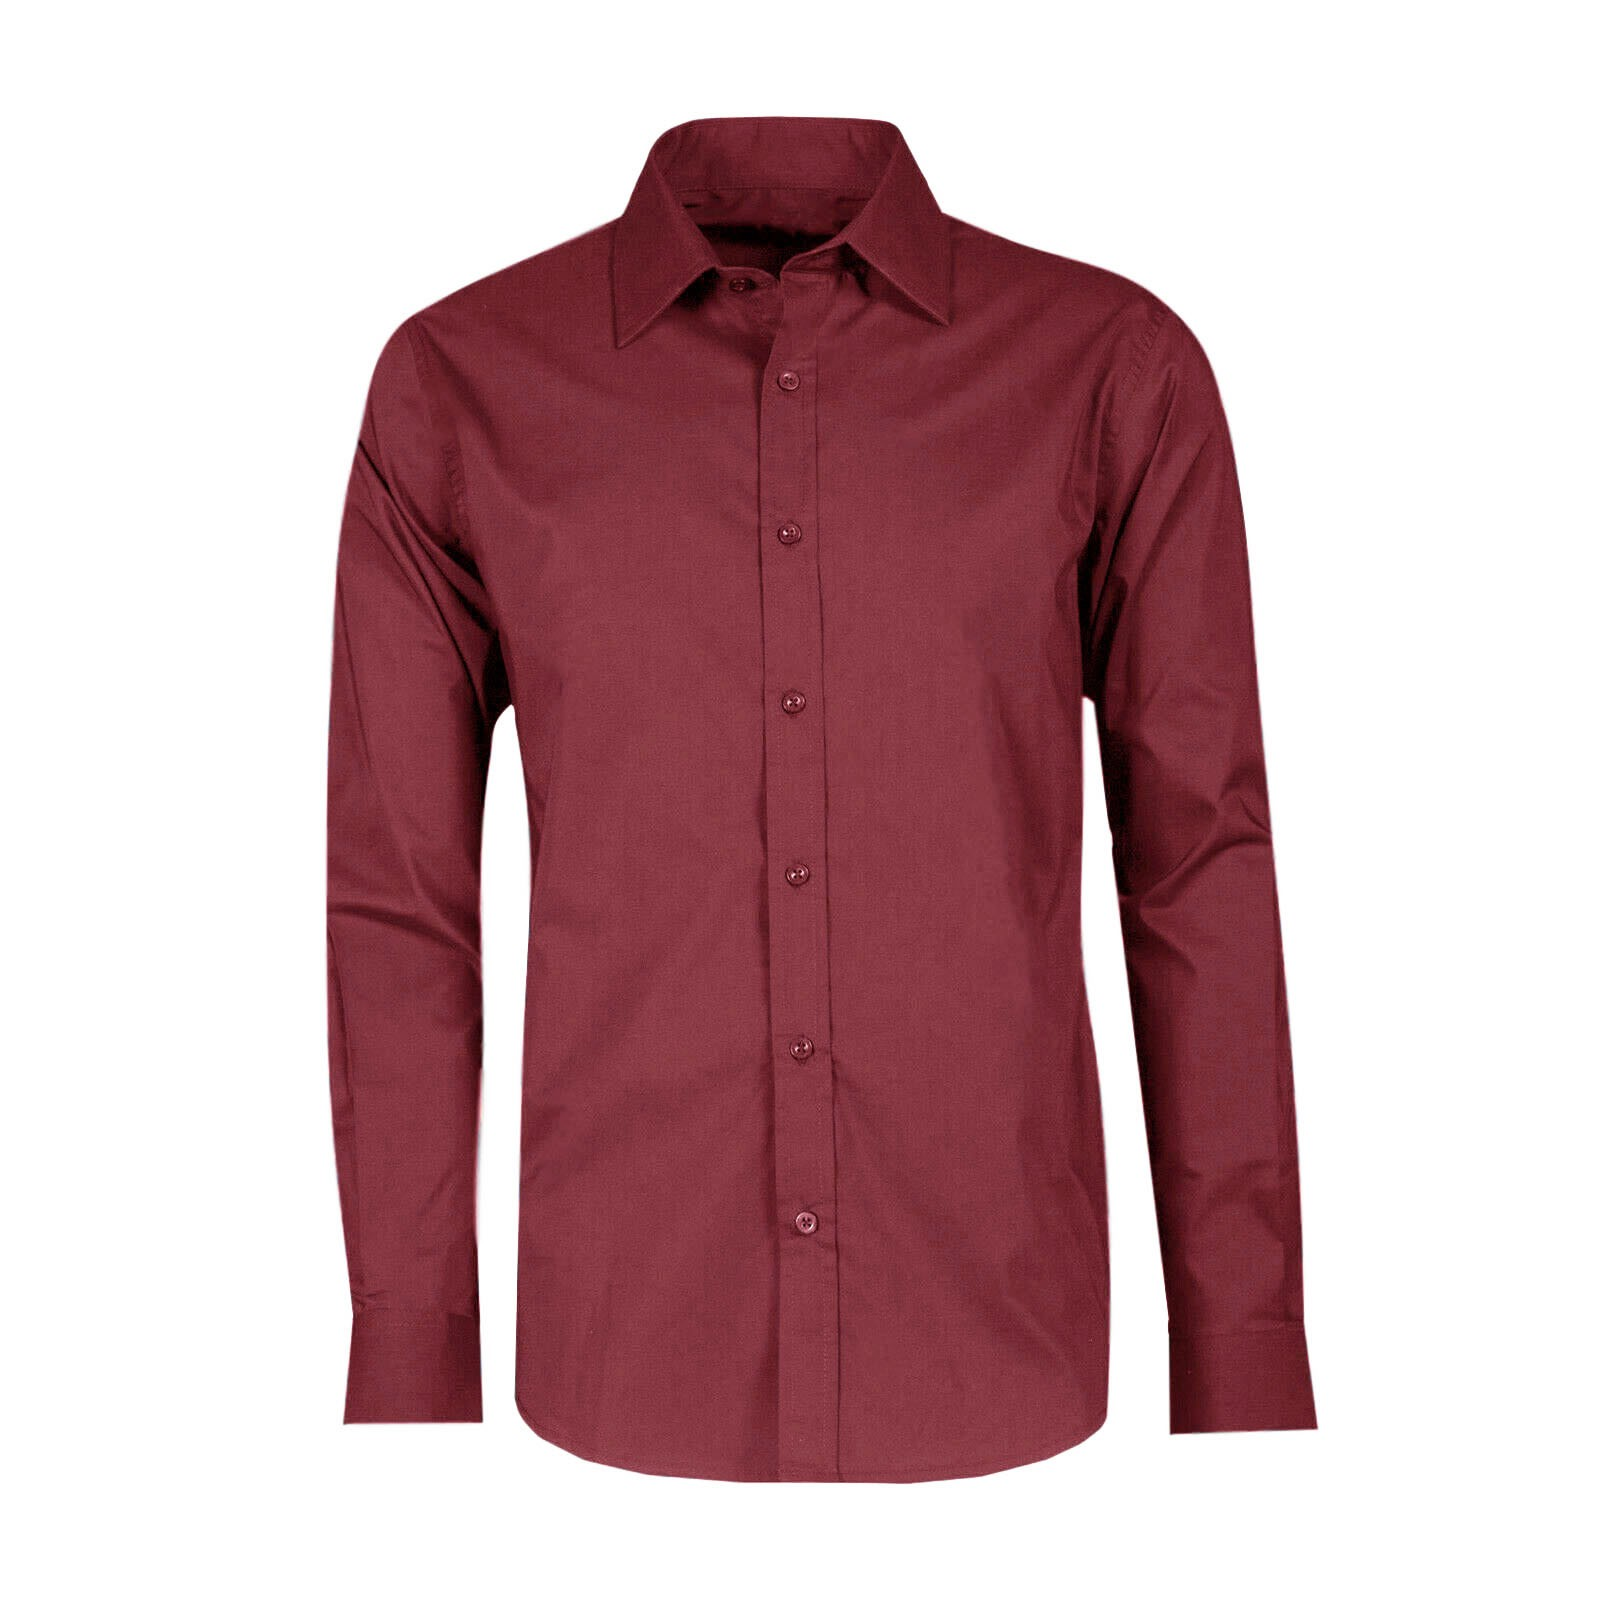 Camicia-Uomo-Celeste-Bianca-Slim-Fit-Manica-Lunga-Sartoriale-Cotone-TG-S-7XL miniatura 30